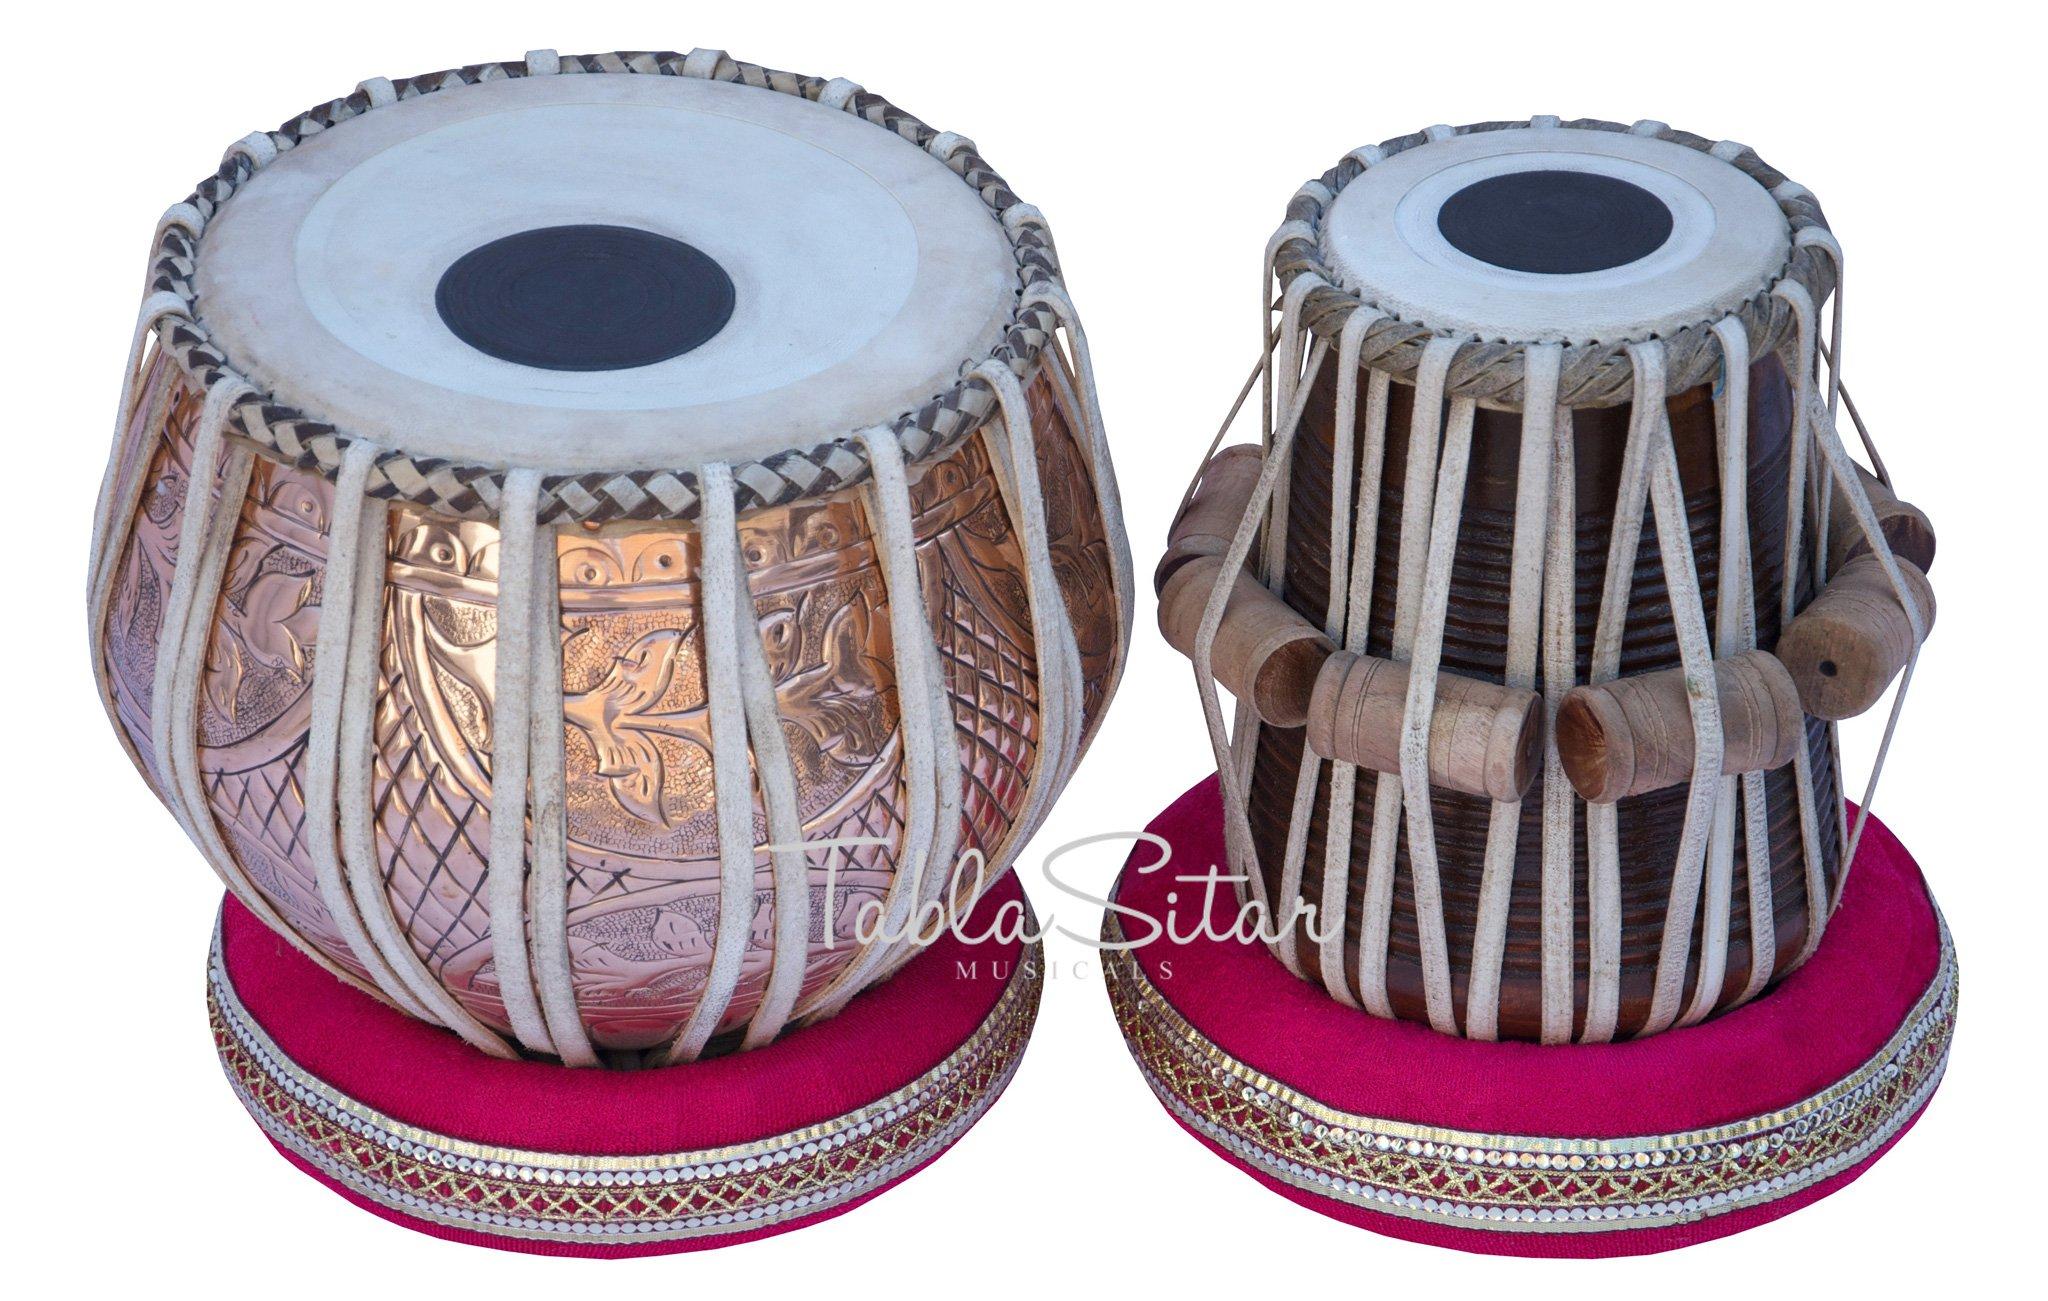 Tabla Drum Set by Maharaja Musicals, Professional, 3.5 Kg Copper Bayan - Designer Carving, Sheesham Tabla Dayan, Padded Bag, Book, Hammer, Cushions, Cover, Tabla Musical Instrument (PDI-CJH) by Maharaja Musicals (Image #2)